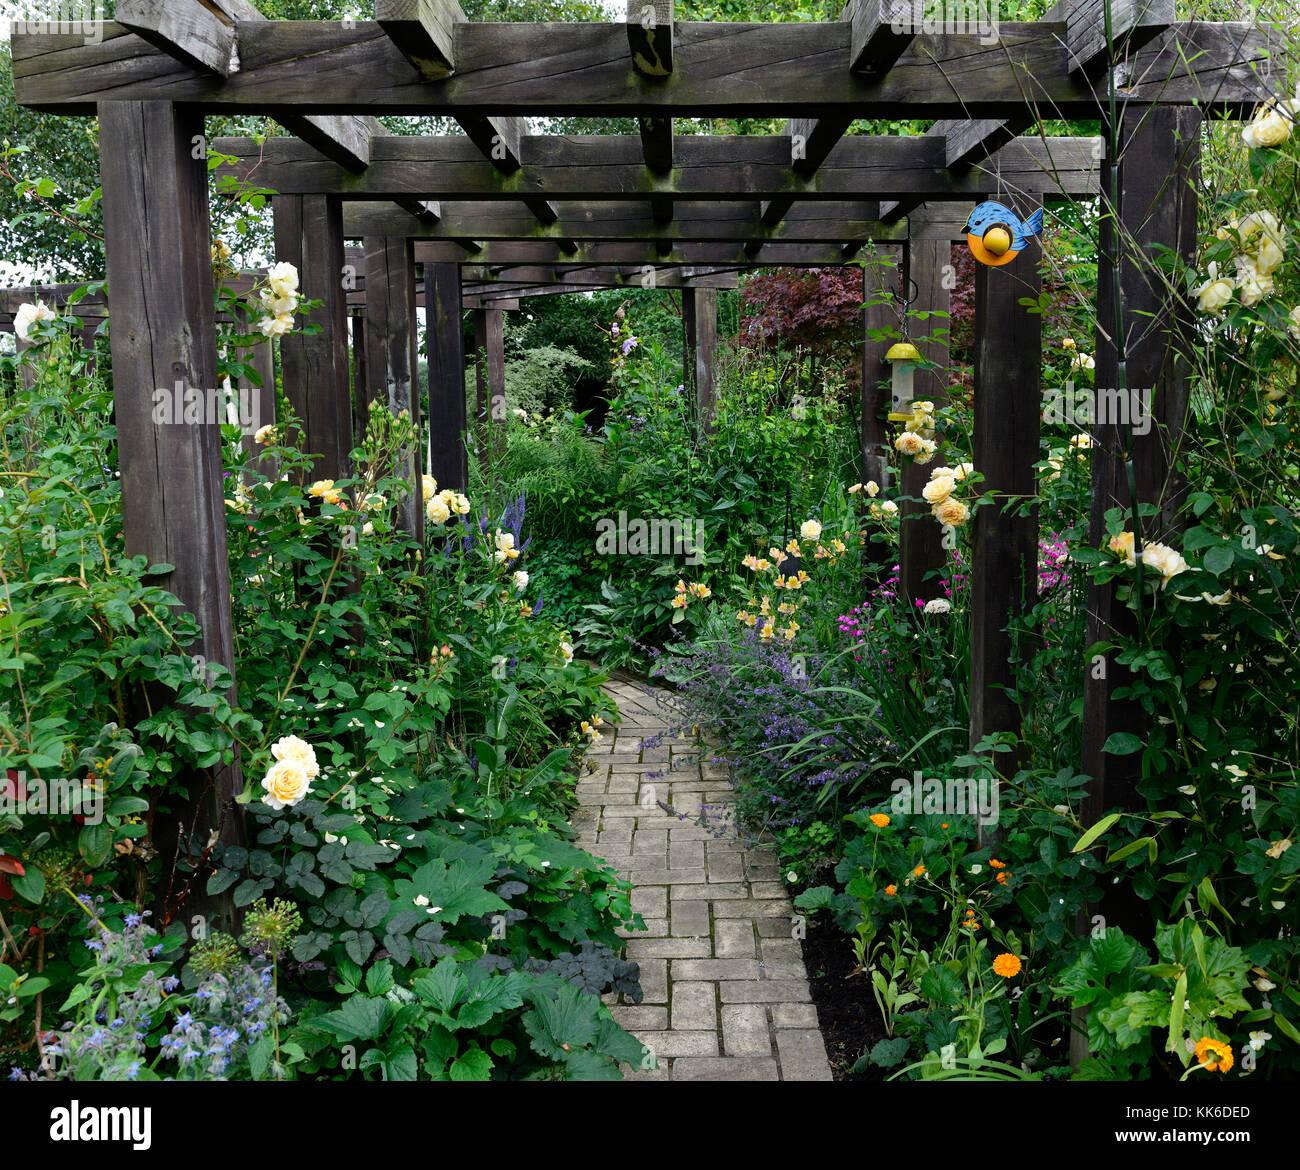 Delicieux Wood, Wooden,arbor, Pergola, Garden, Entrance, Separation, Separating,